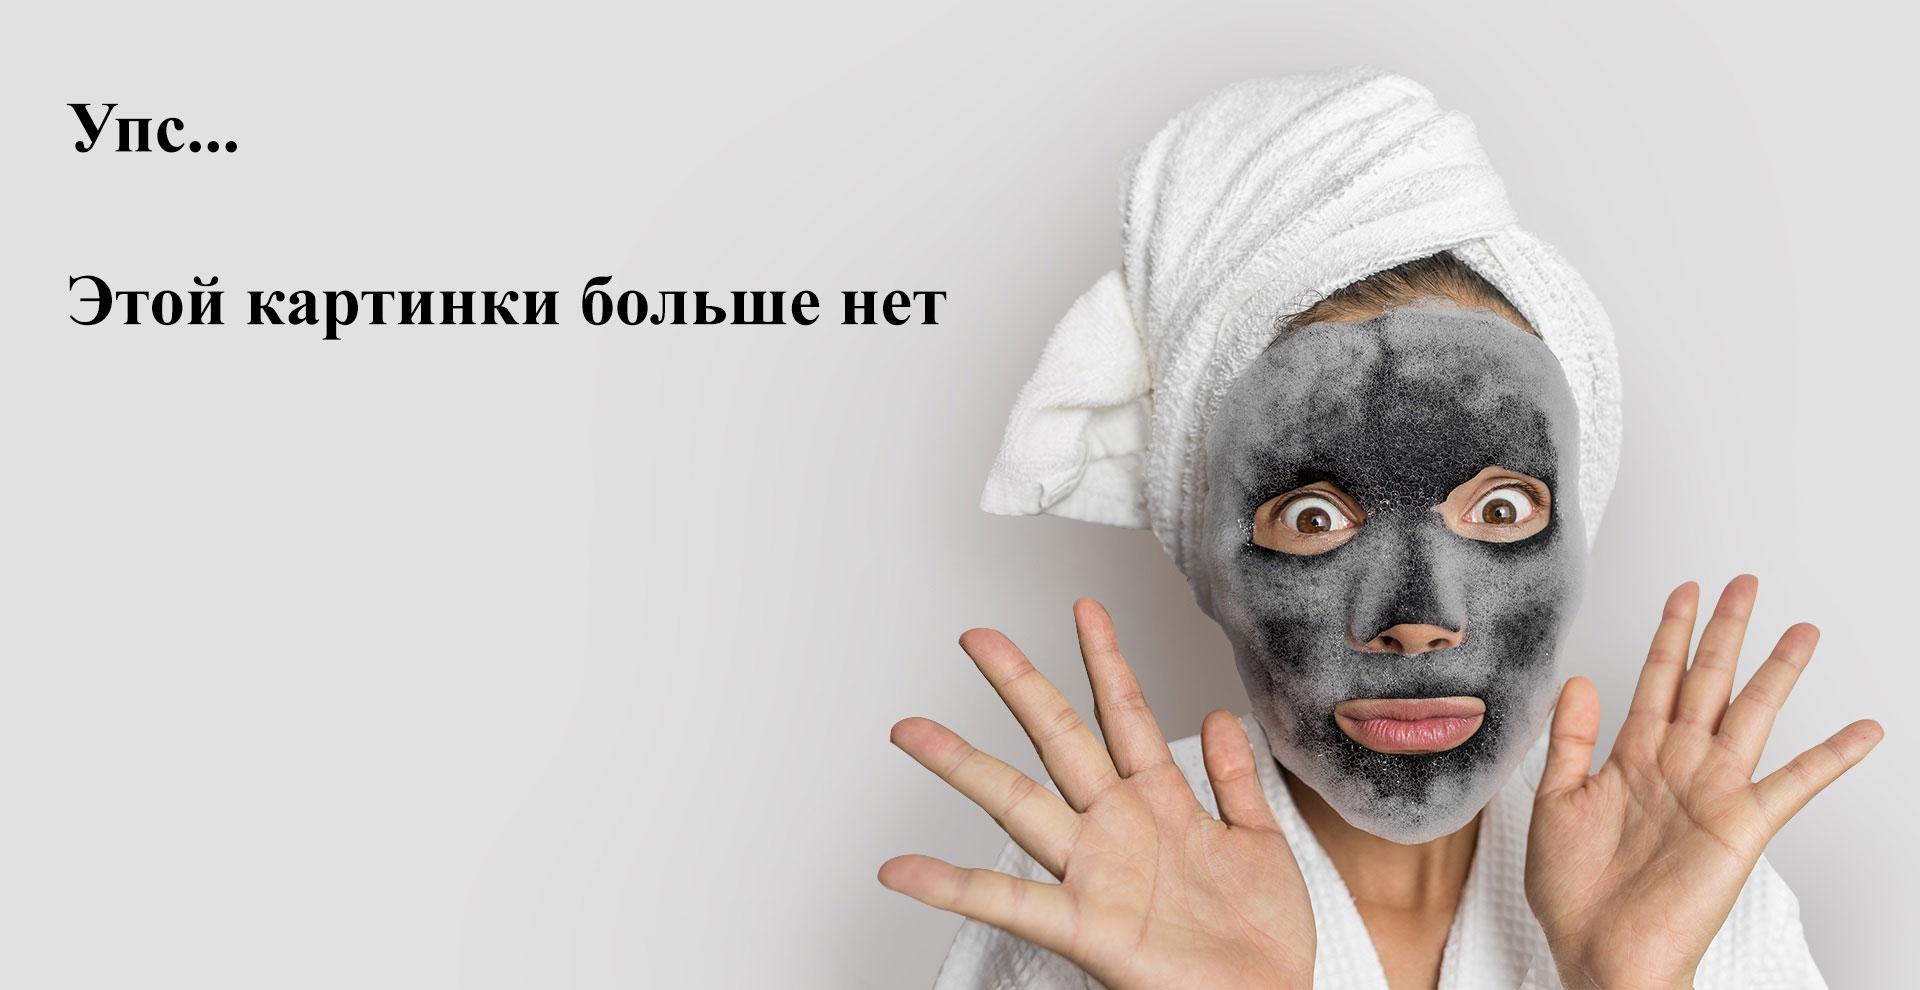 Igrobeauty, Пакет для педикюрных ванн XL, 65х50 см